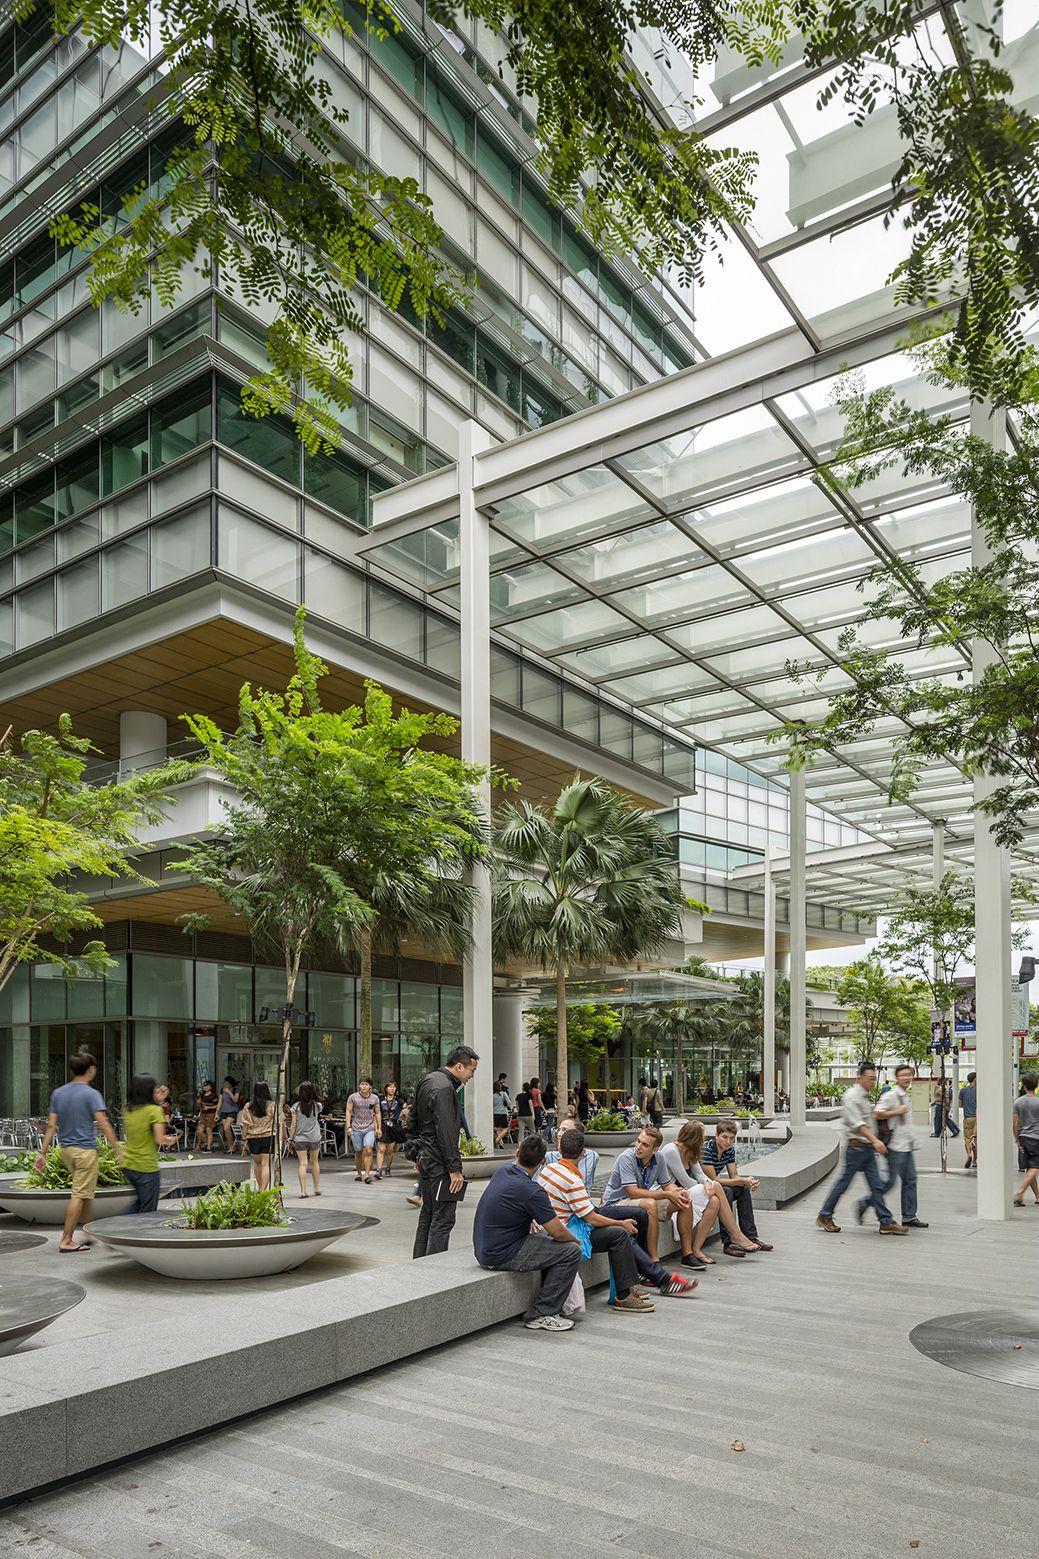 Galeria De Create Campus For Research Excellence And Technological Enterprise Perkins Will 5 Landscape Architecture Design University Architecture Urban Architecture